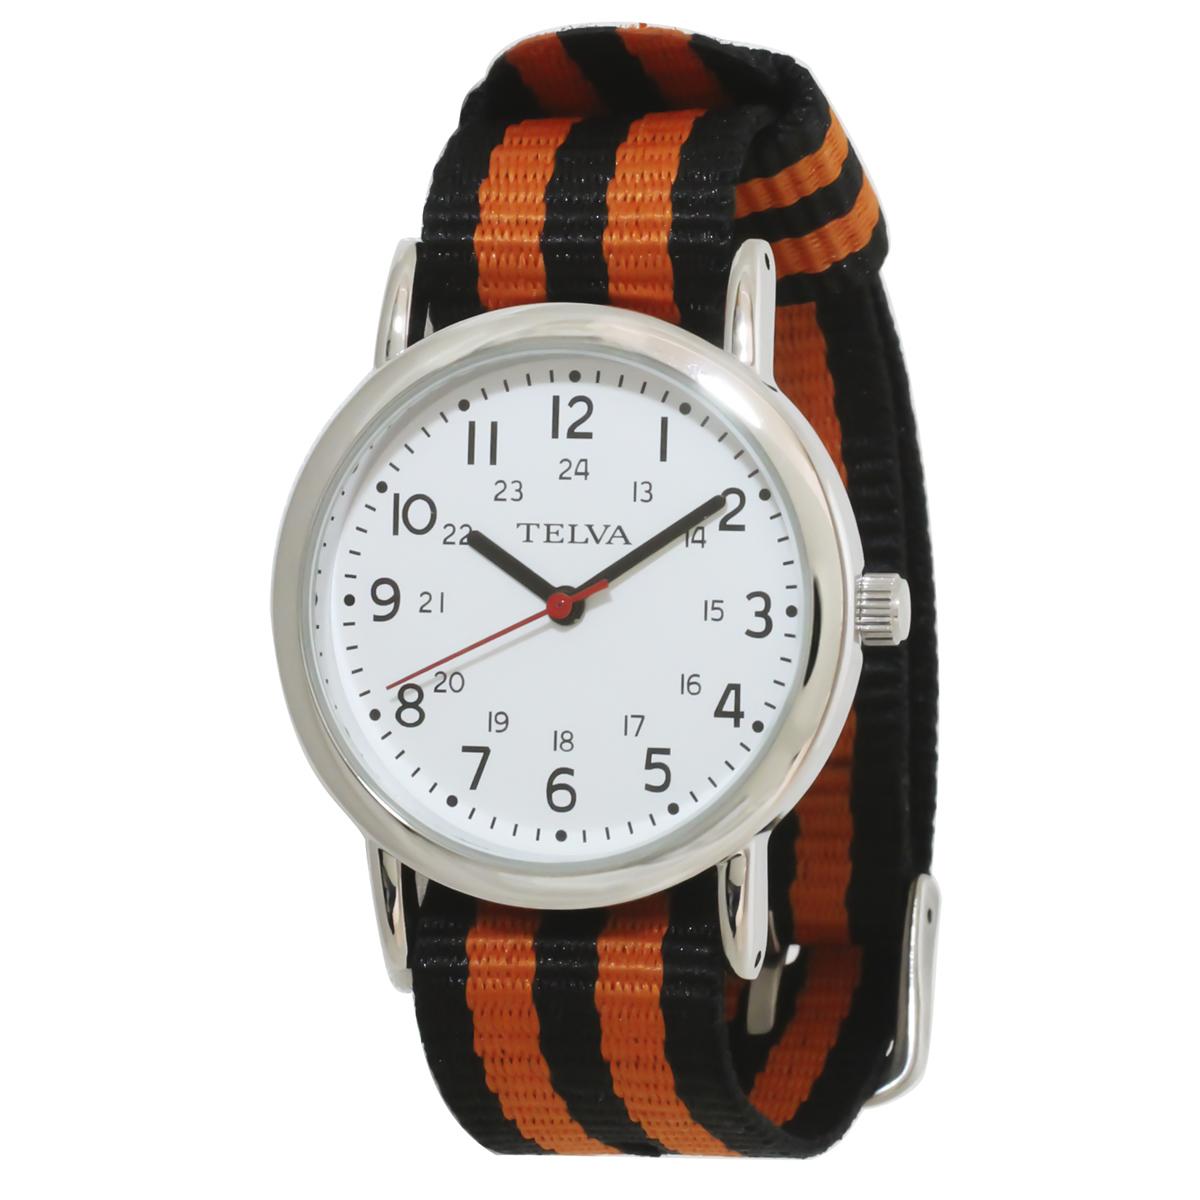 TELVA テルバ アナログウオッチ NATOバンド メンズ レディース 腕時計【TE-AM042】